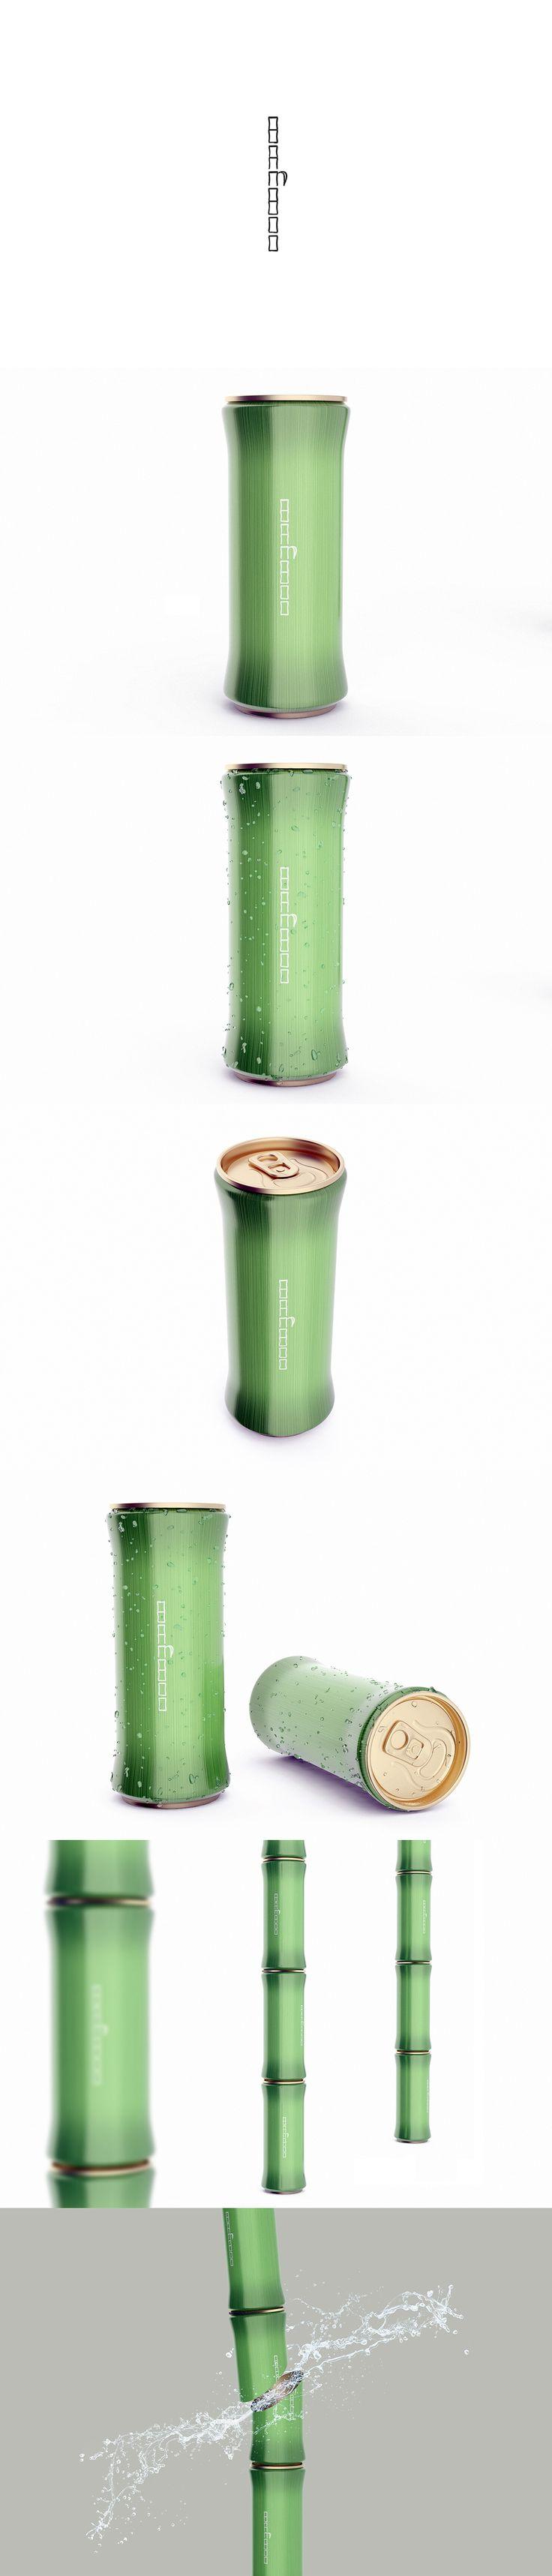 Bamboo juice, Package © МарсельШейшенов